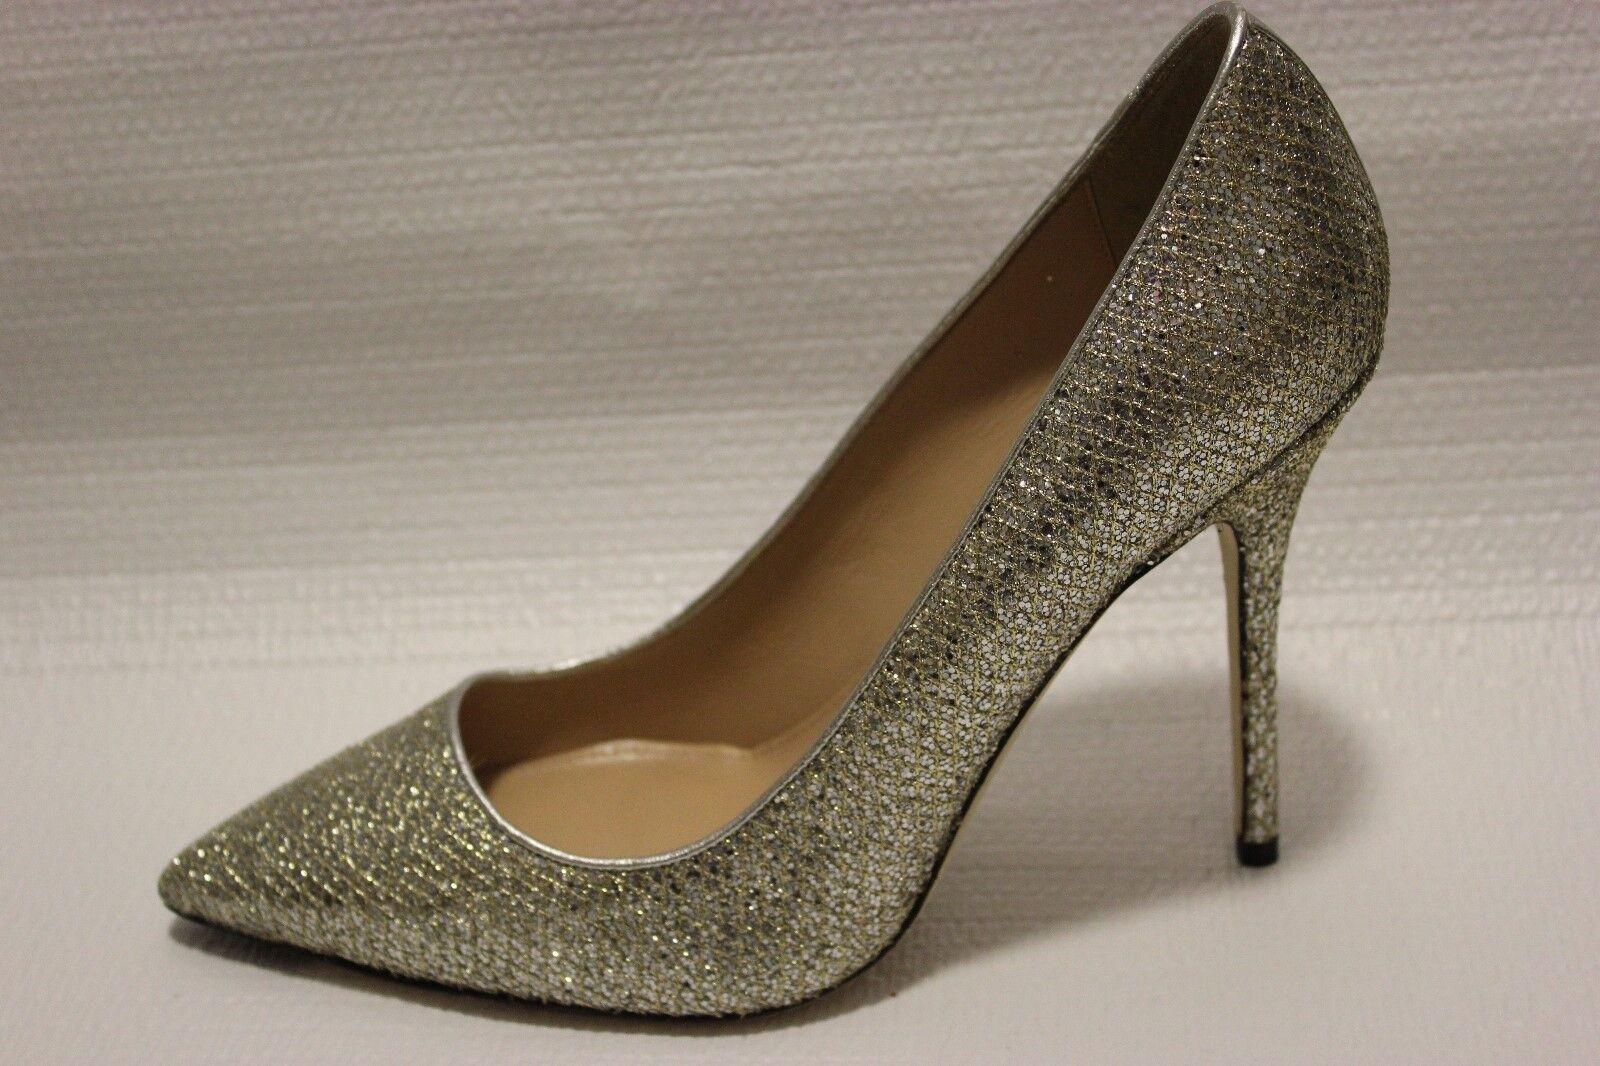 J Crew Roxie Mermaid Glitter Pumps Heels 8.5 shoes  278 gold Silver  e0784